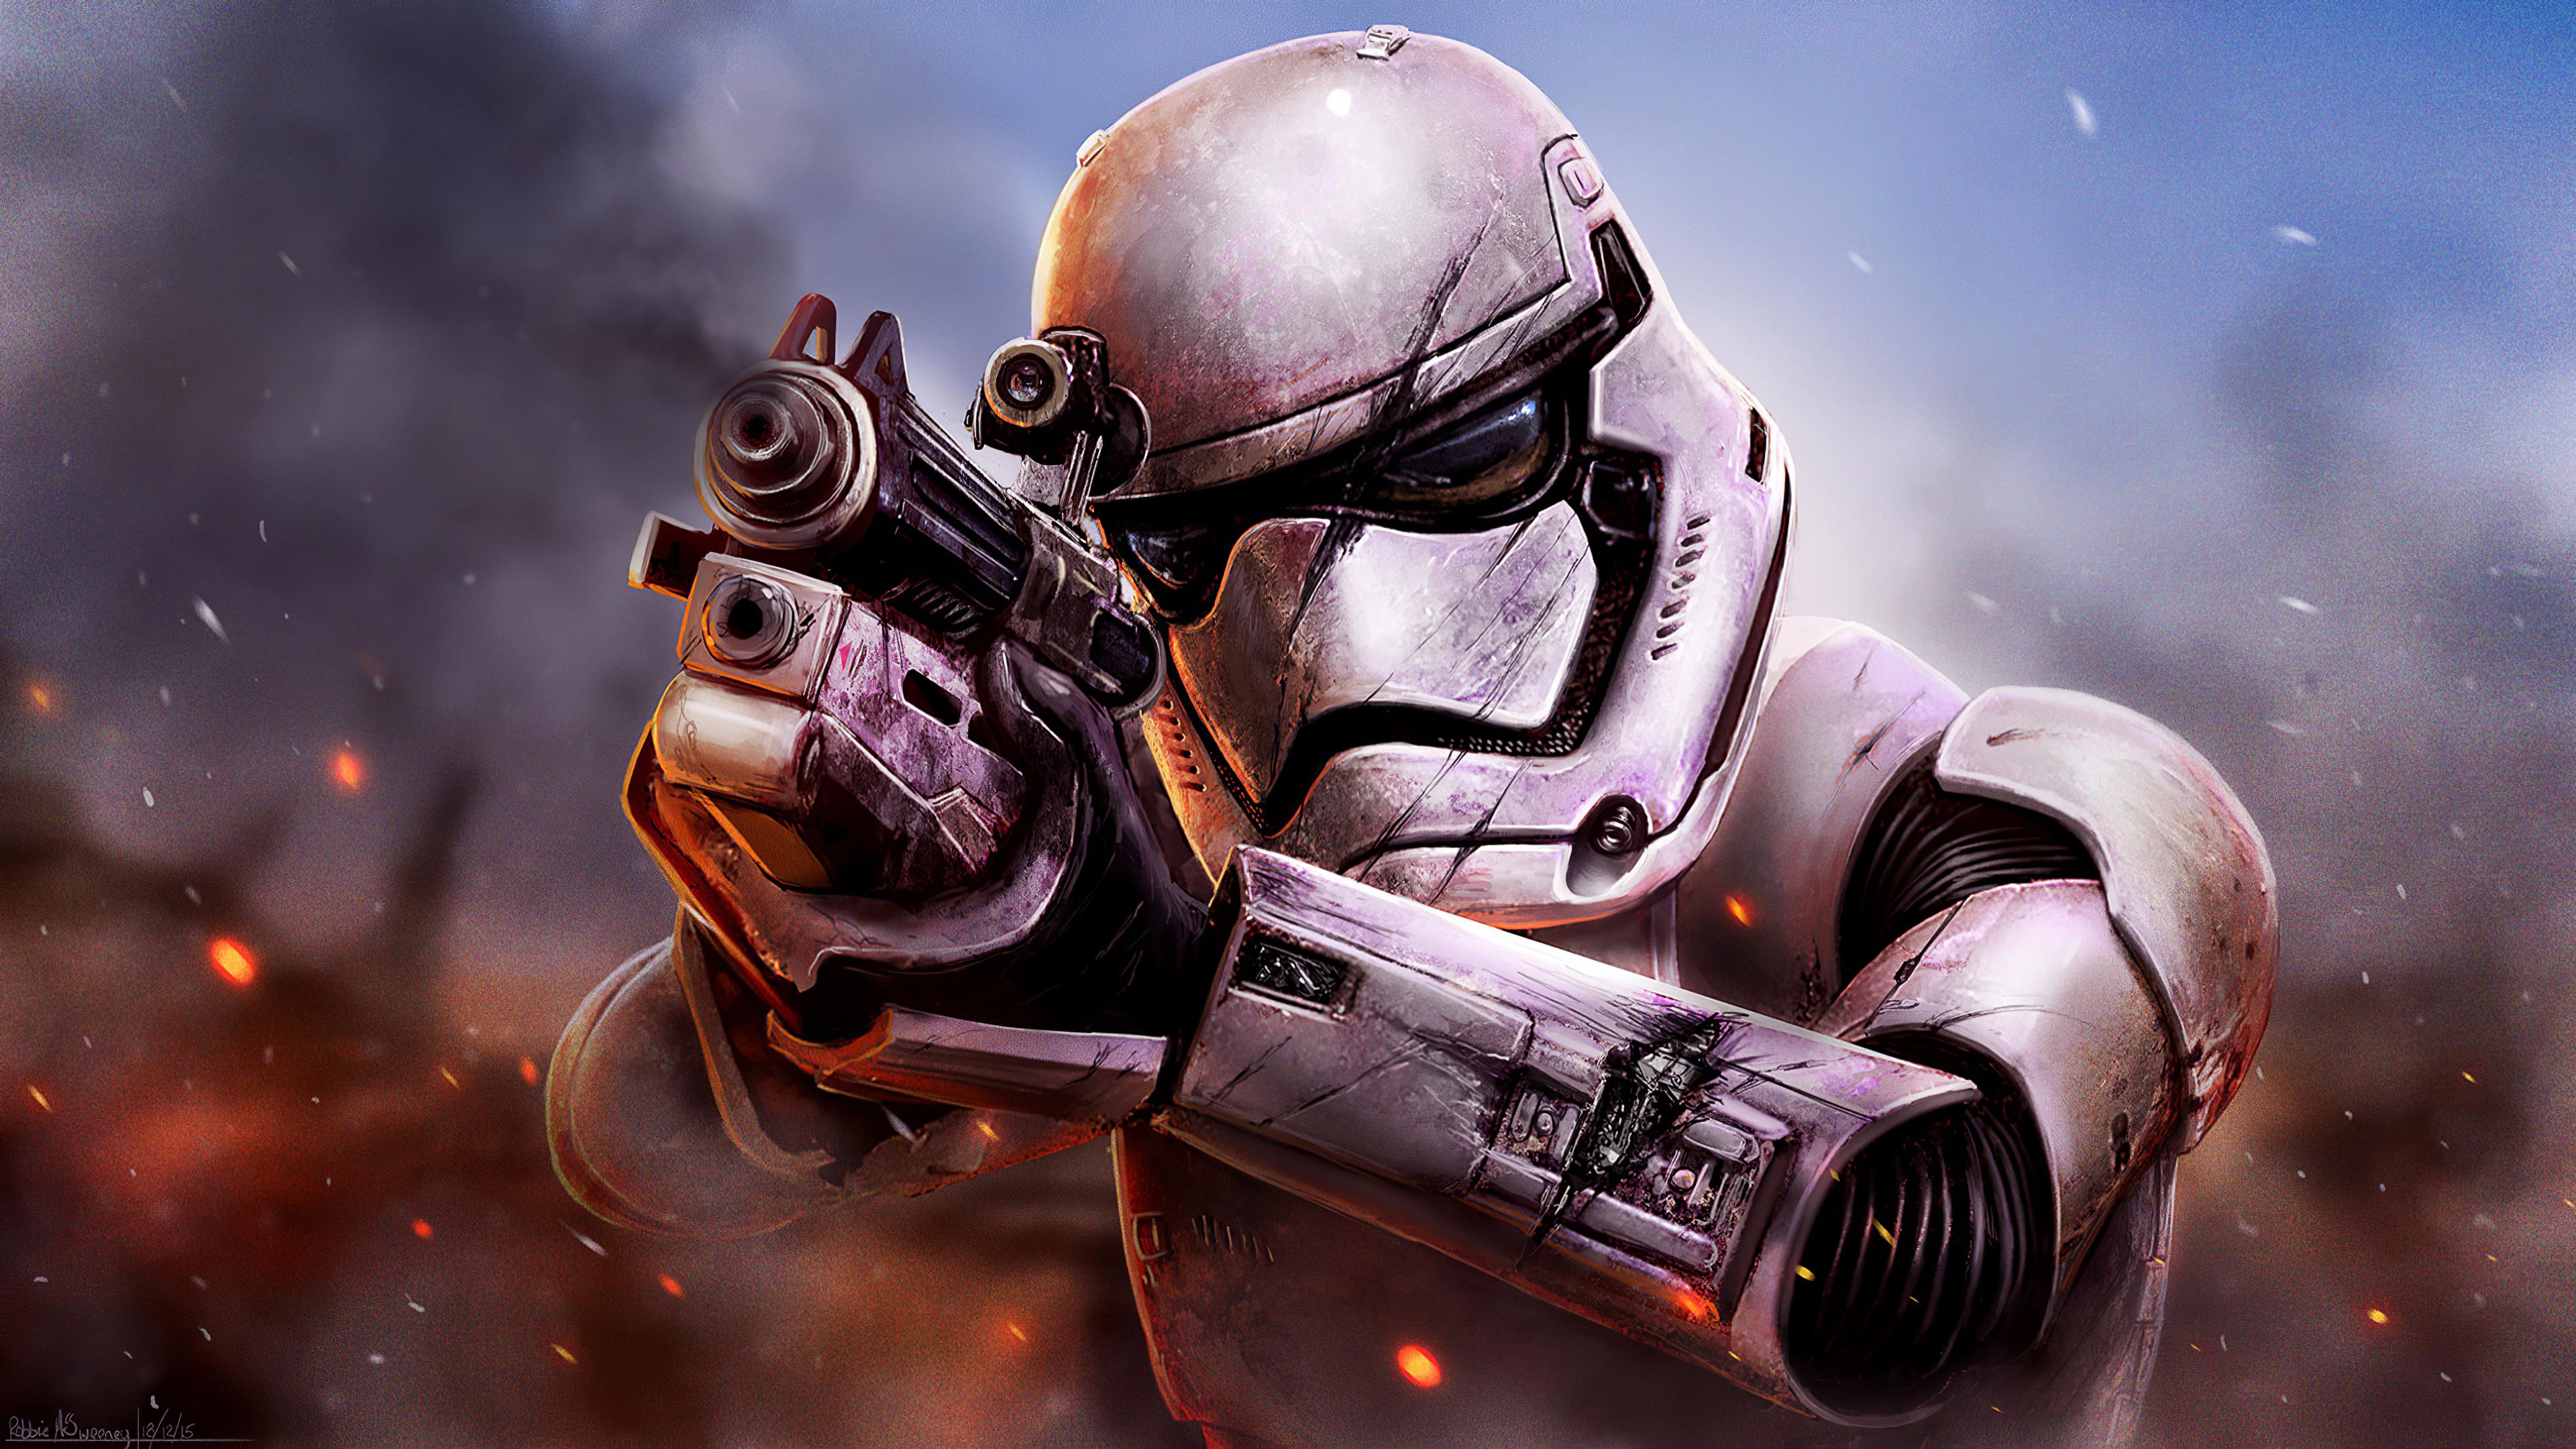 Star Wars Battlefront Stormtrooper, HD